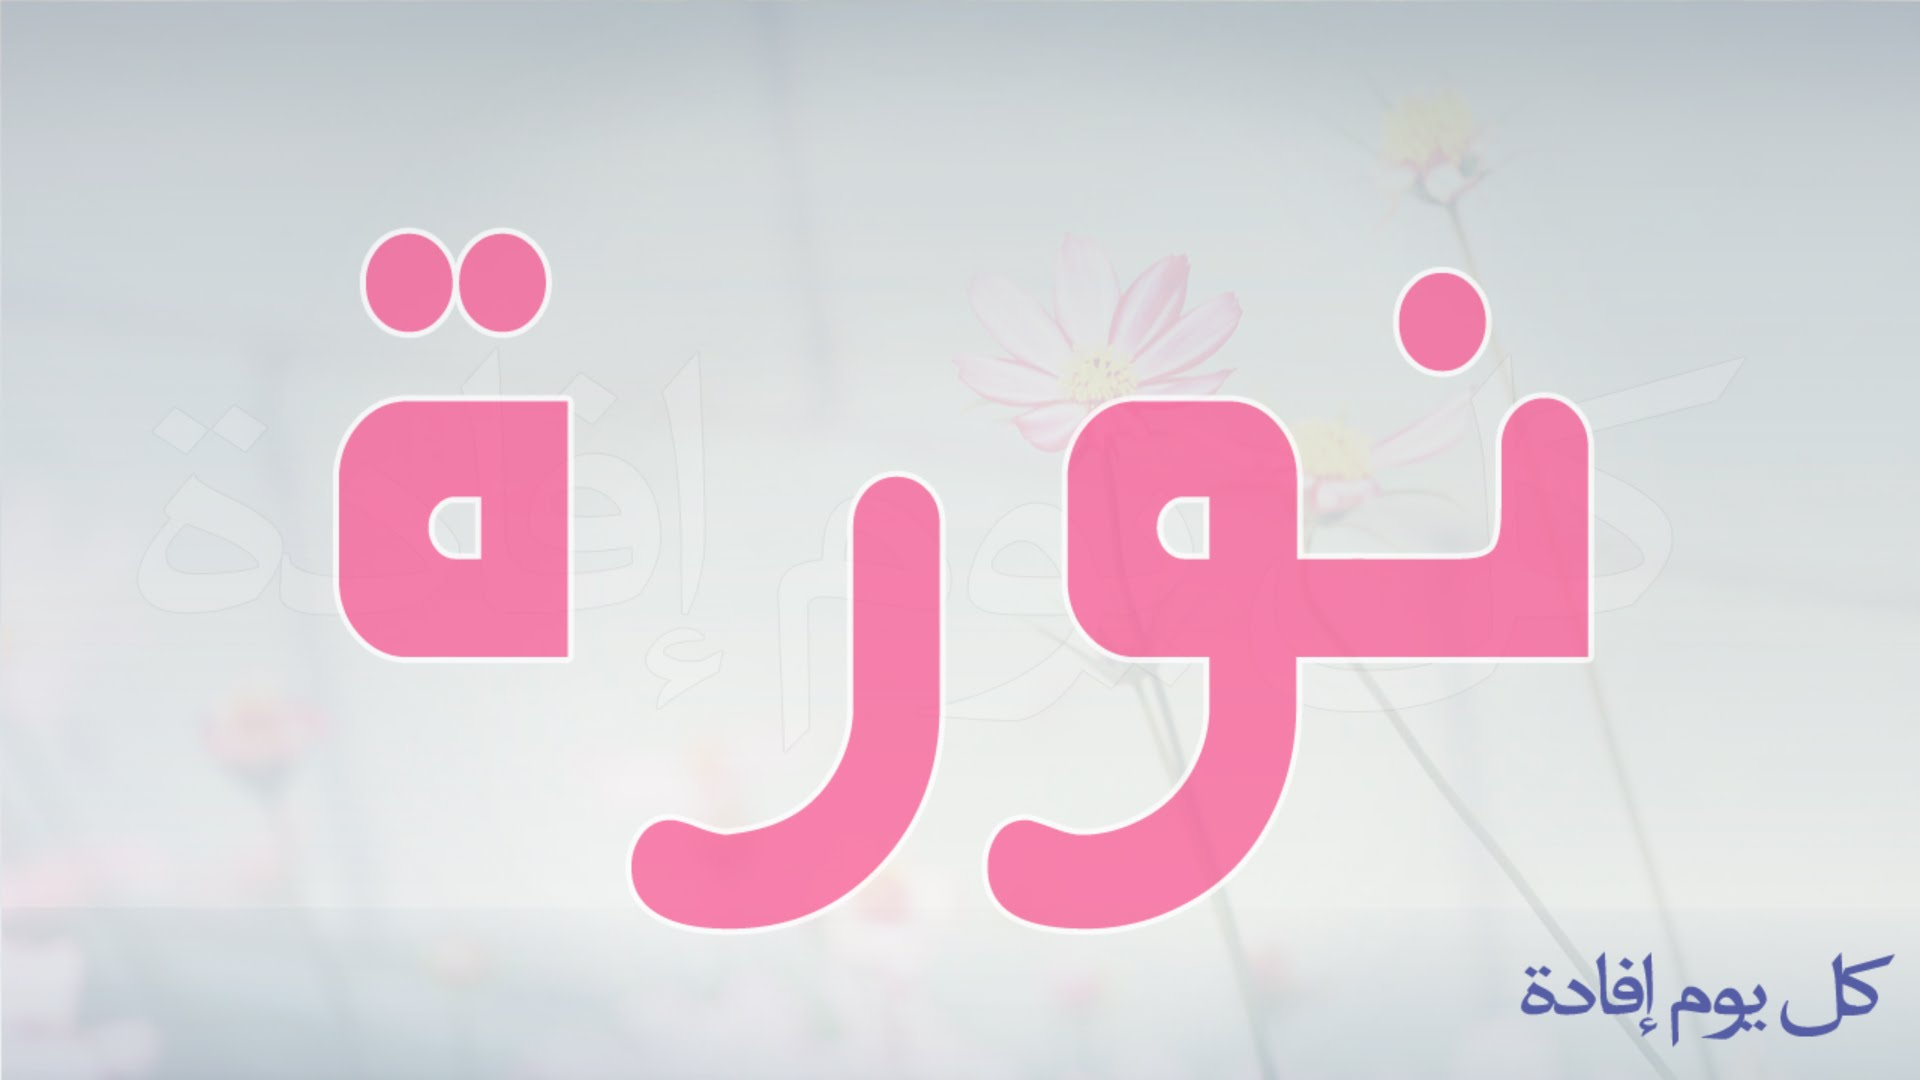 صوره معنى اسم نوره , معاني اسماء البنات